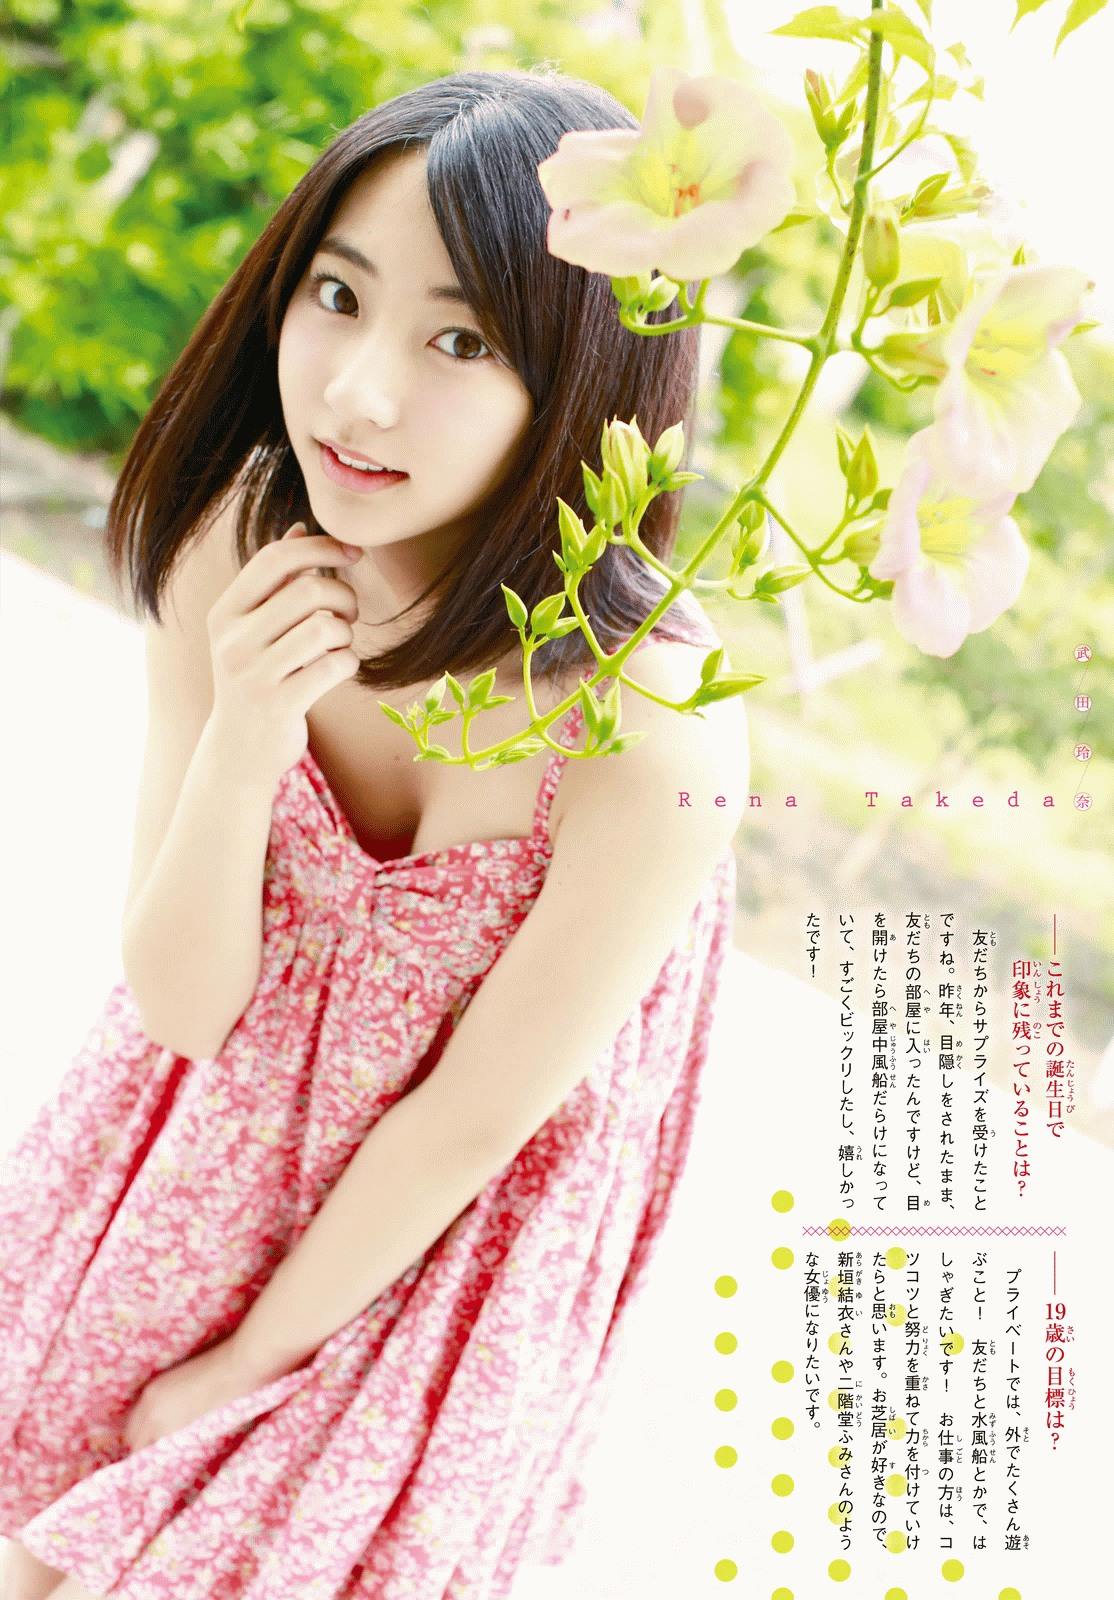 image http://scanlover.com/assets/images/3441-p3JqVNW7Im6FAIRE.jpeg